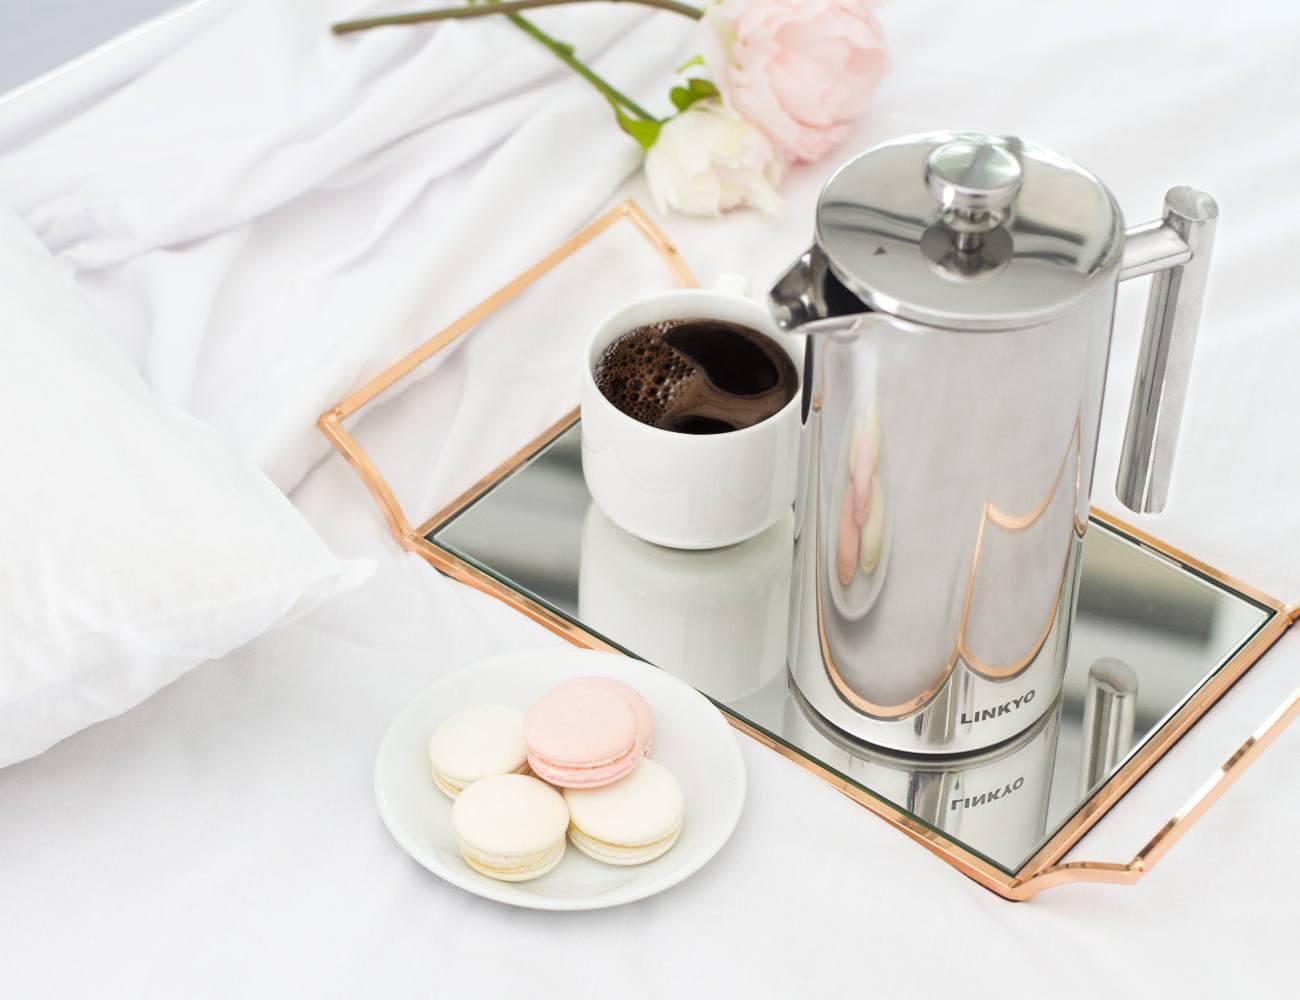 LINKYO French Press Coffee Maker